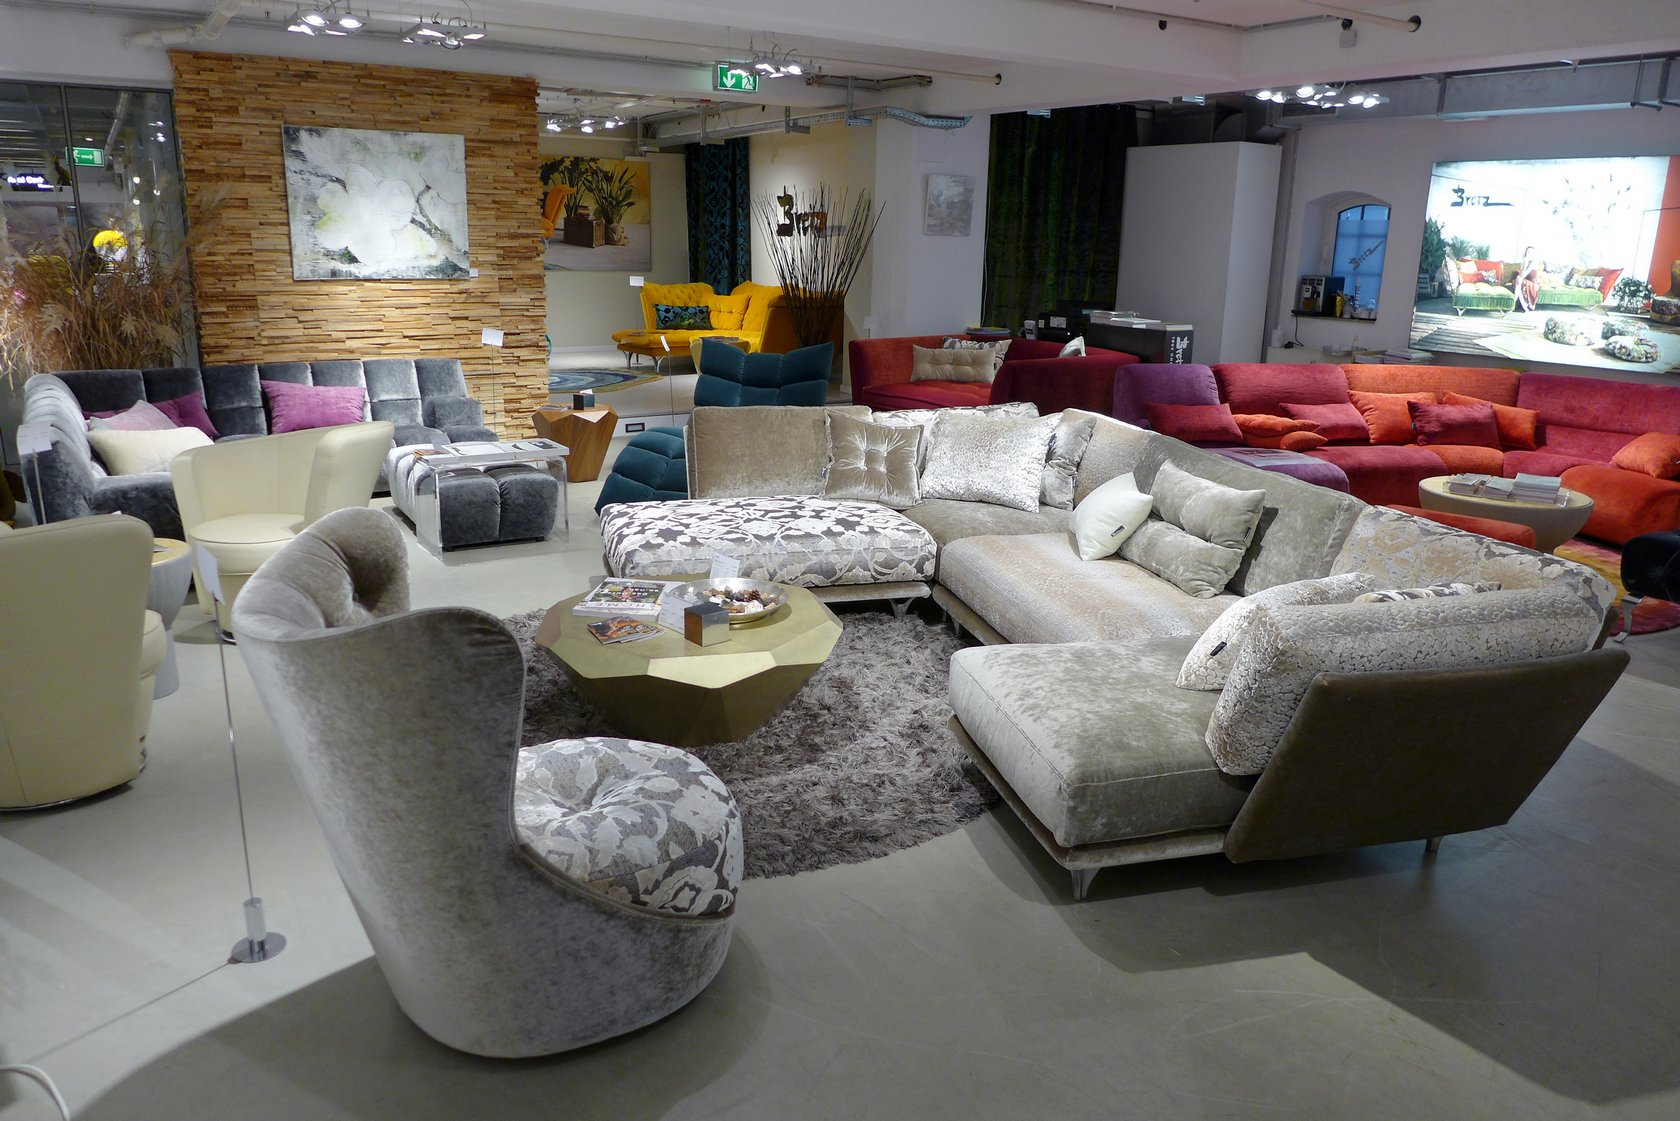 bretz flagship store hamburg stilwerk 2017 06 13 001 bretz store hamburg. Black Bedroom Furniture Sets. Home Design Ideas